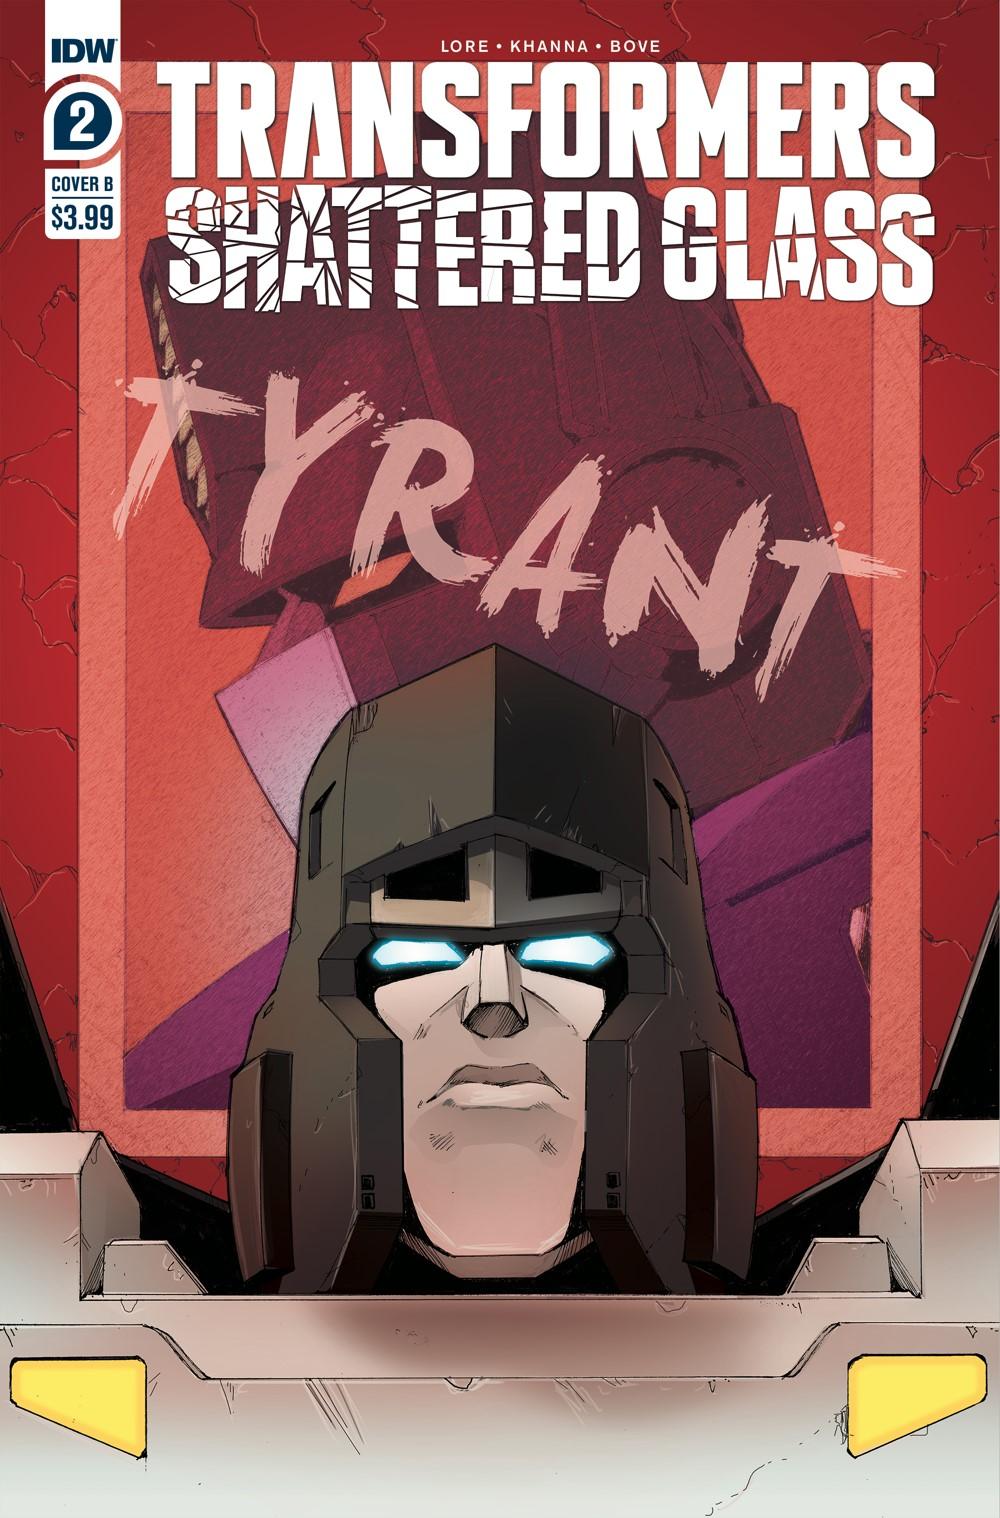 TF_ShatGlass02-cvrB ComicList Previews: TRANSFORMERS SHATTERED GLASS #2 (OF 5)